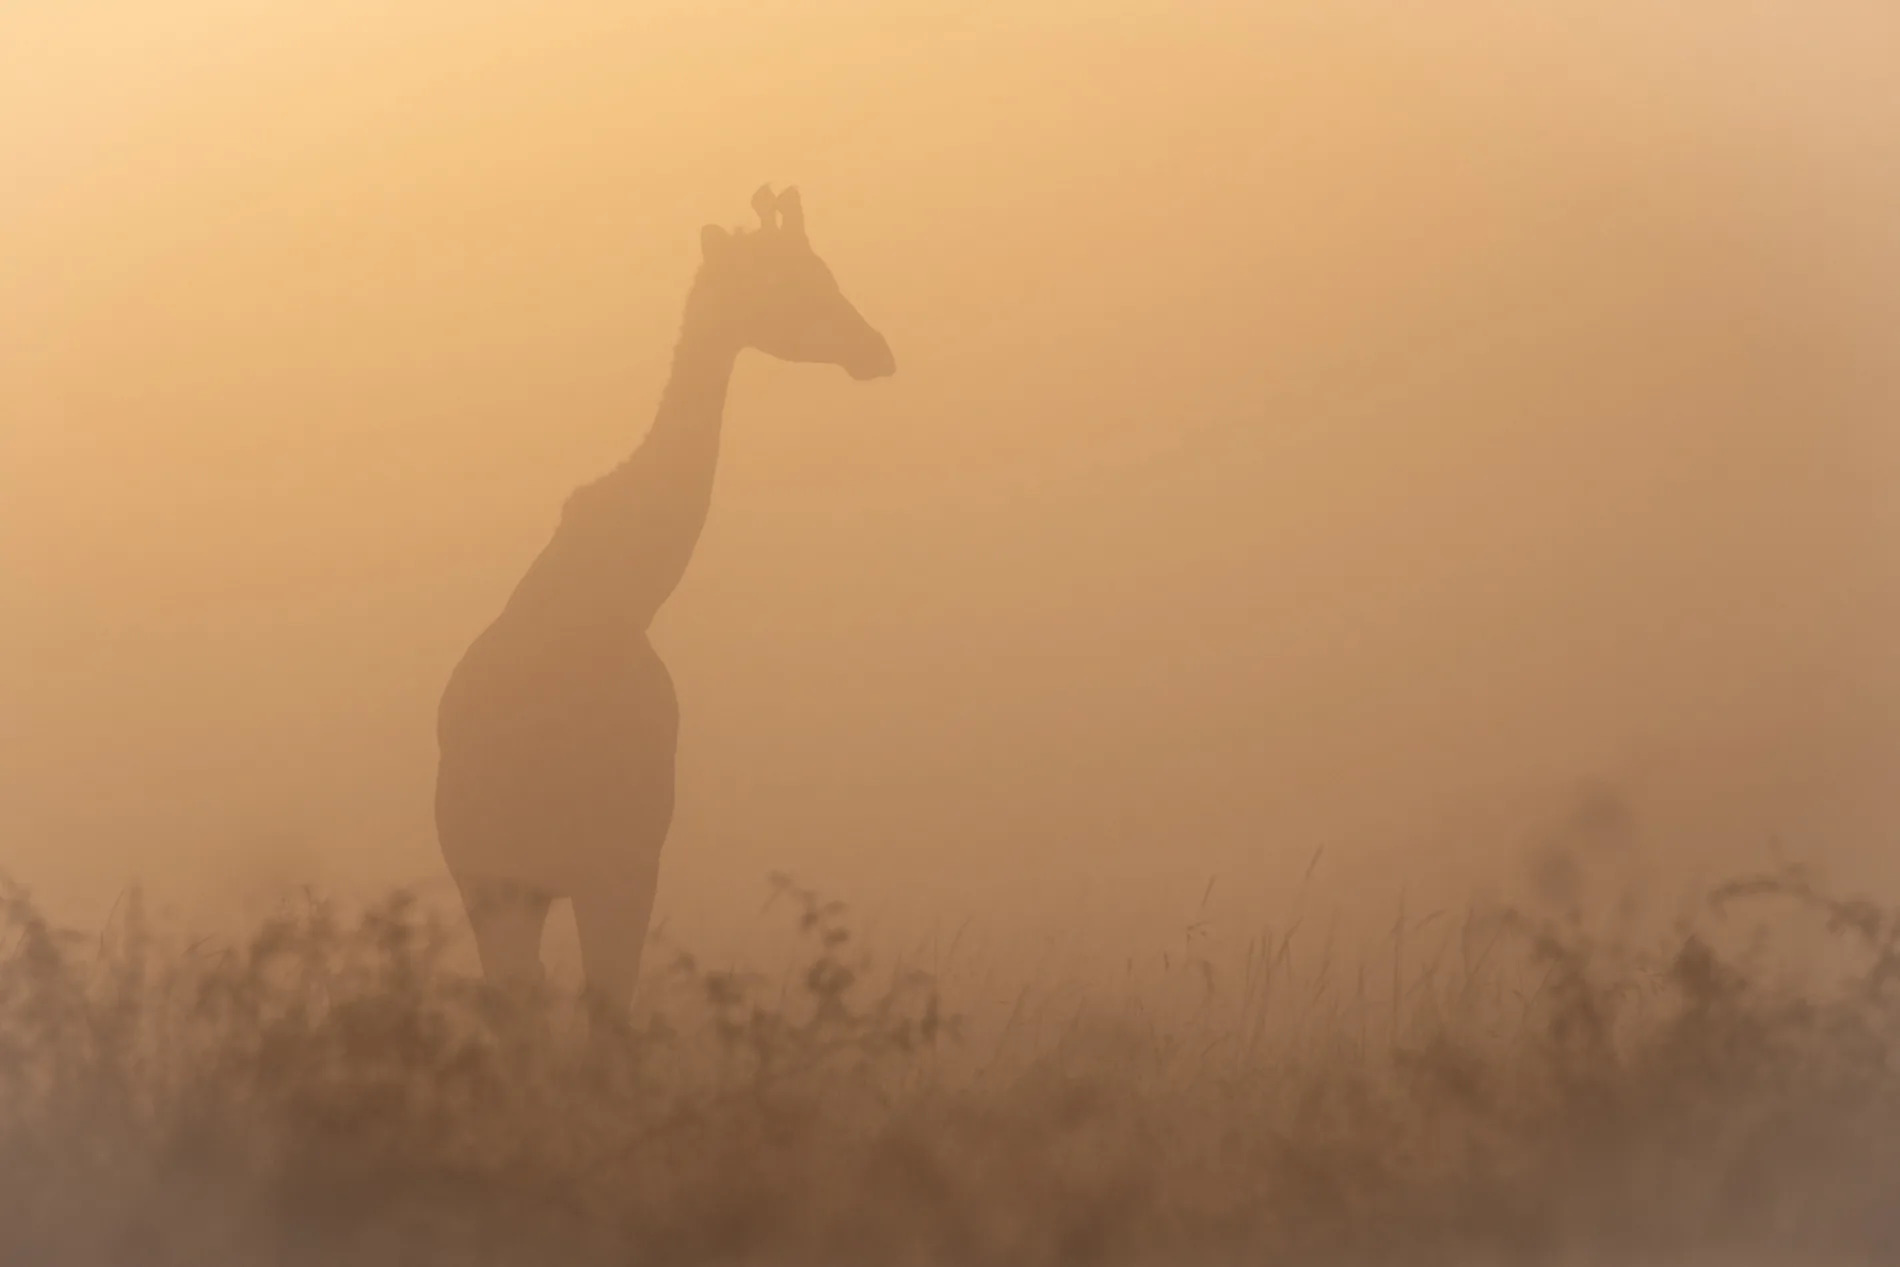 giraffe in mist